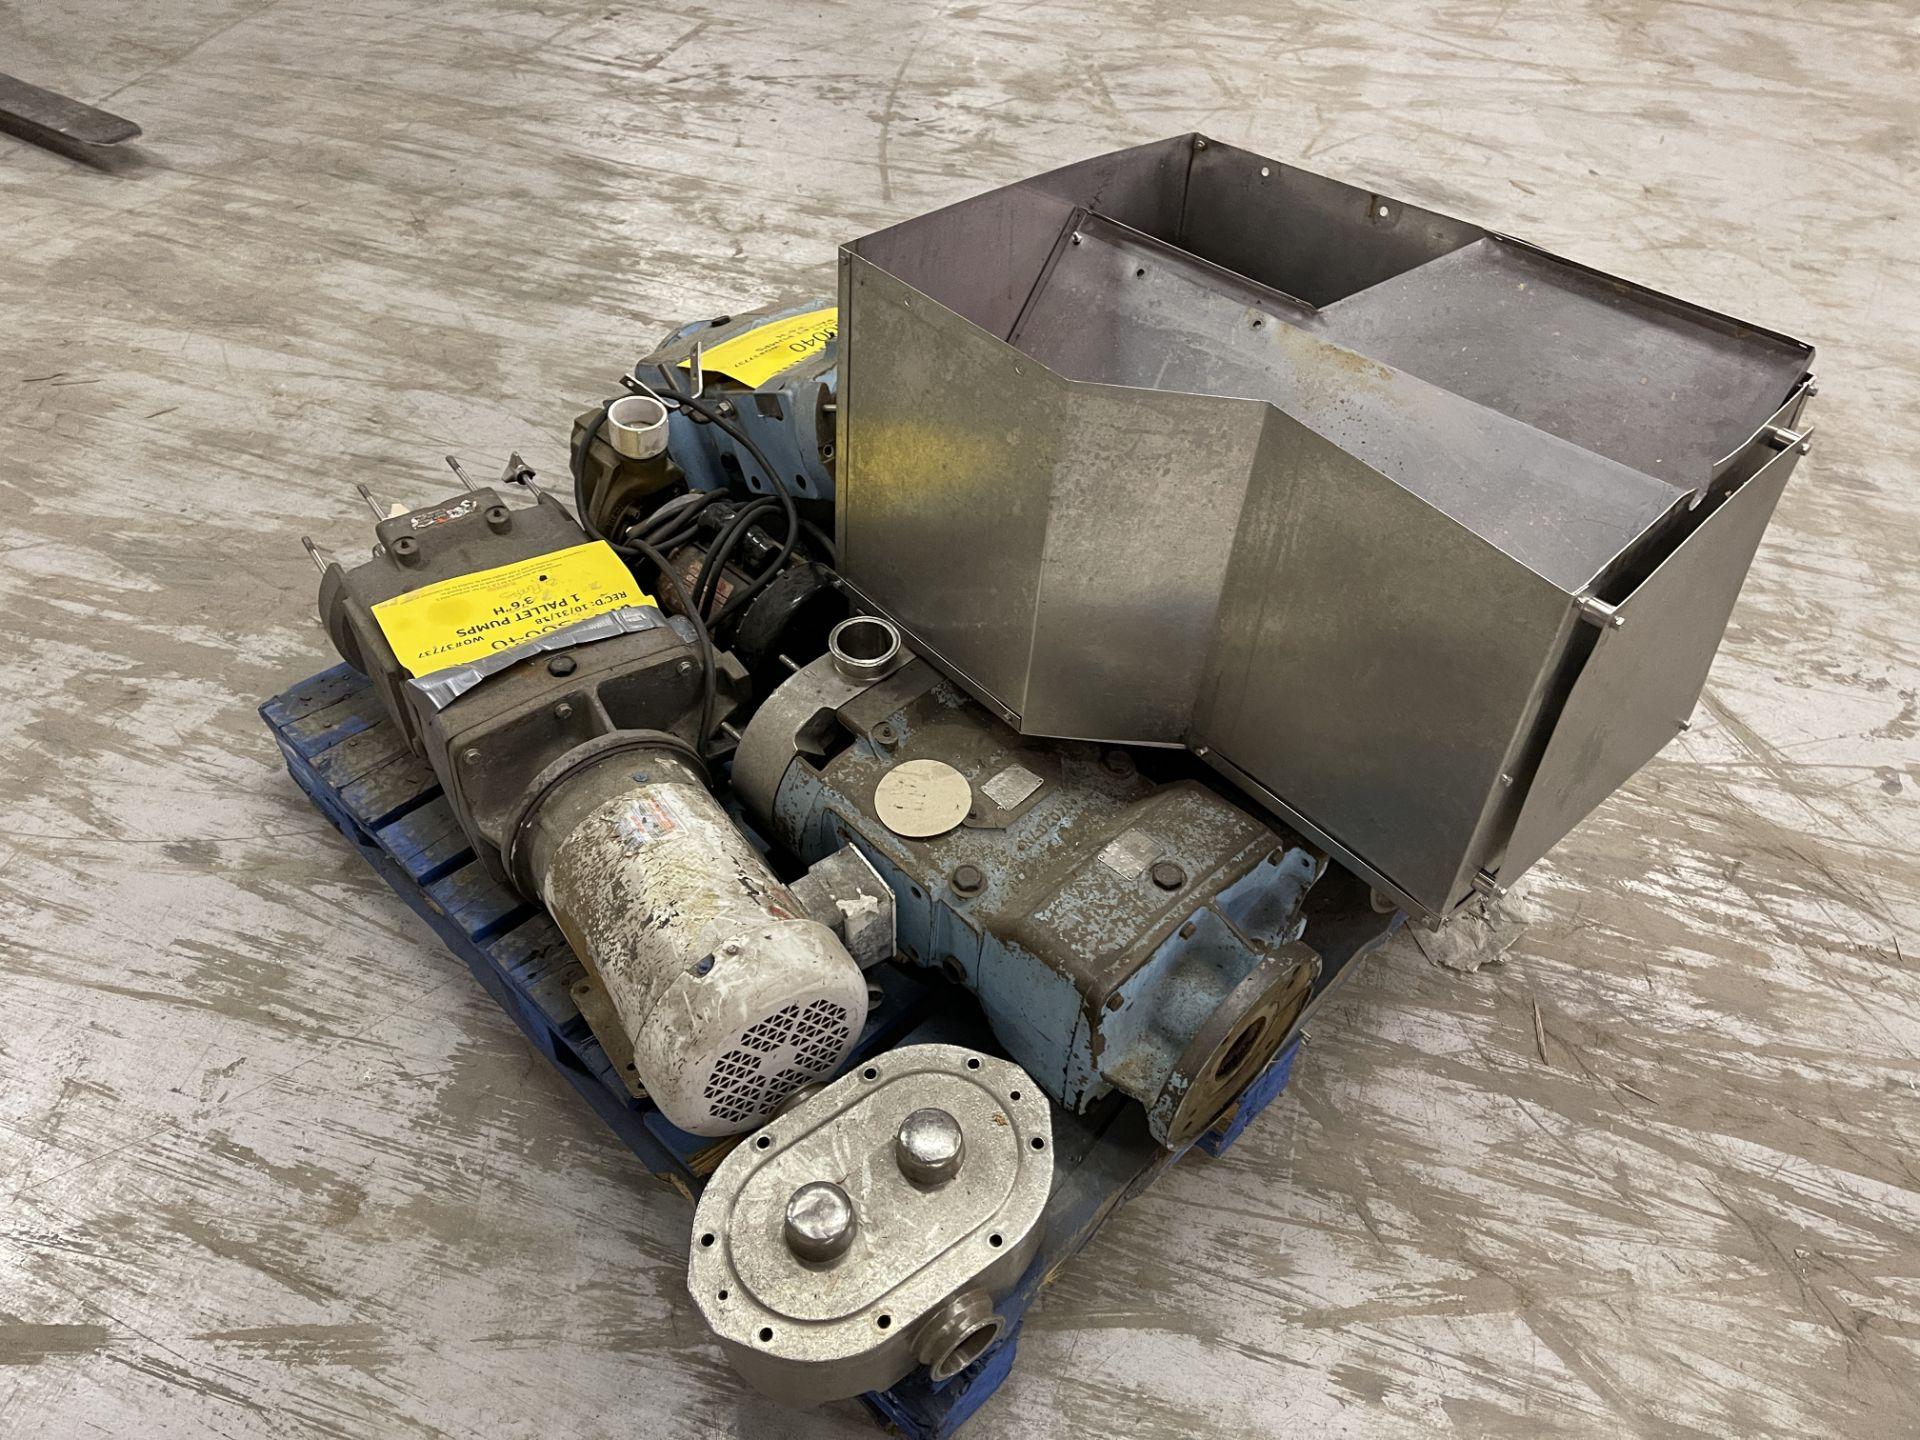 Misc Pump Parts - Image 3 of 3